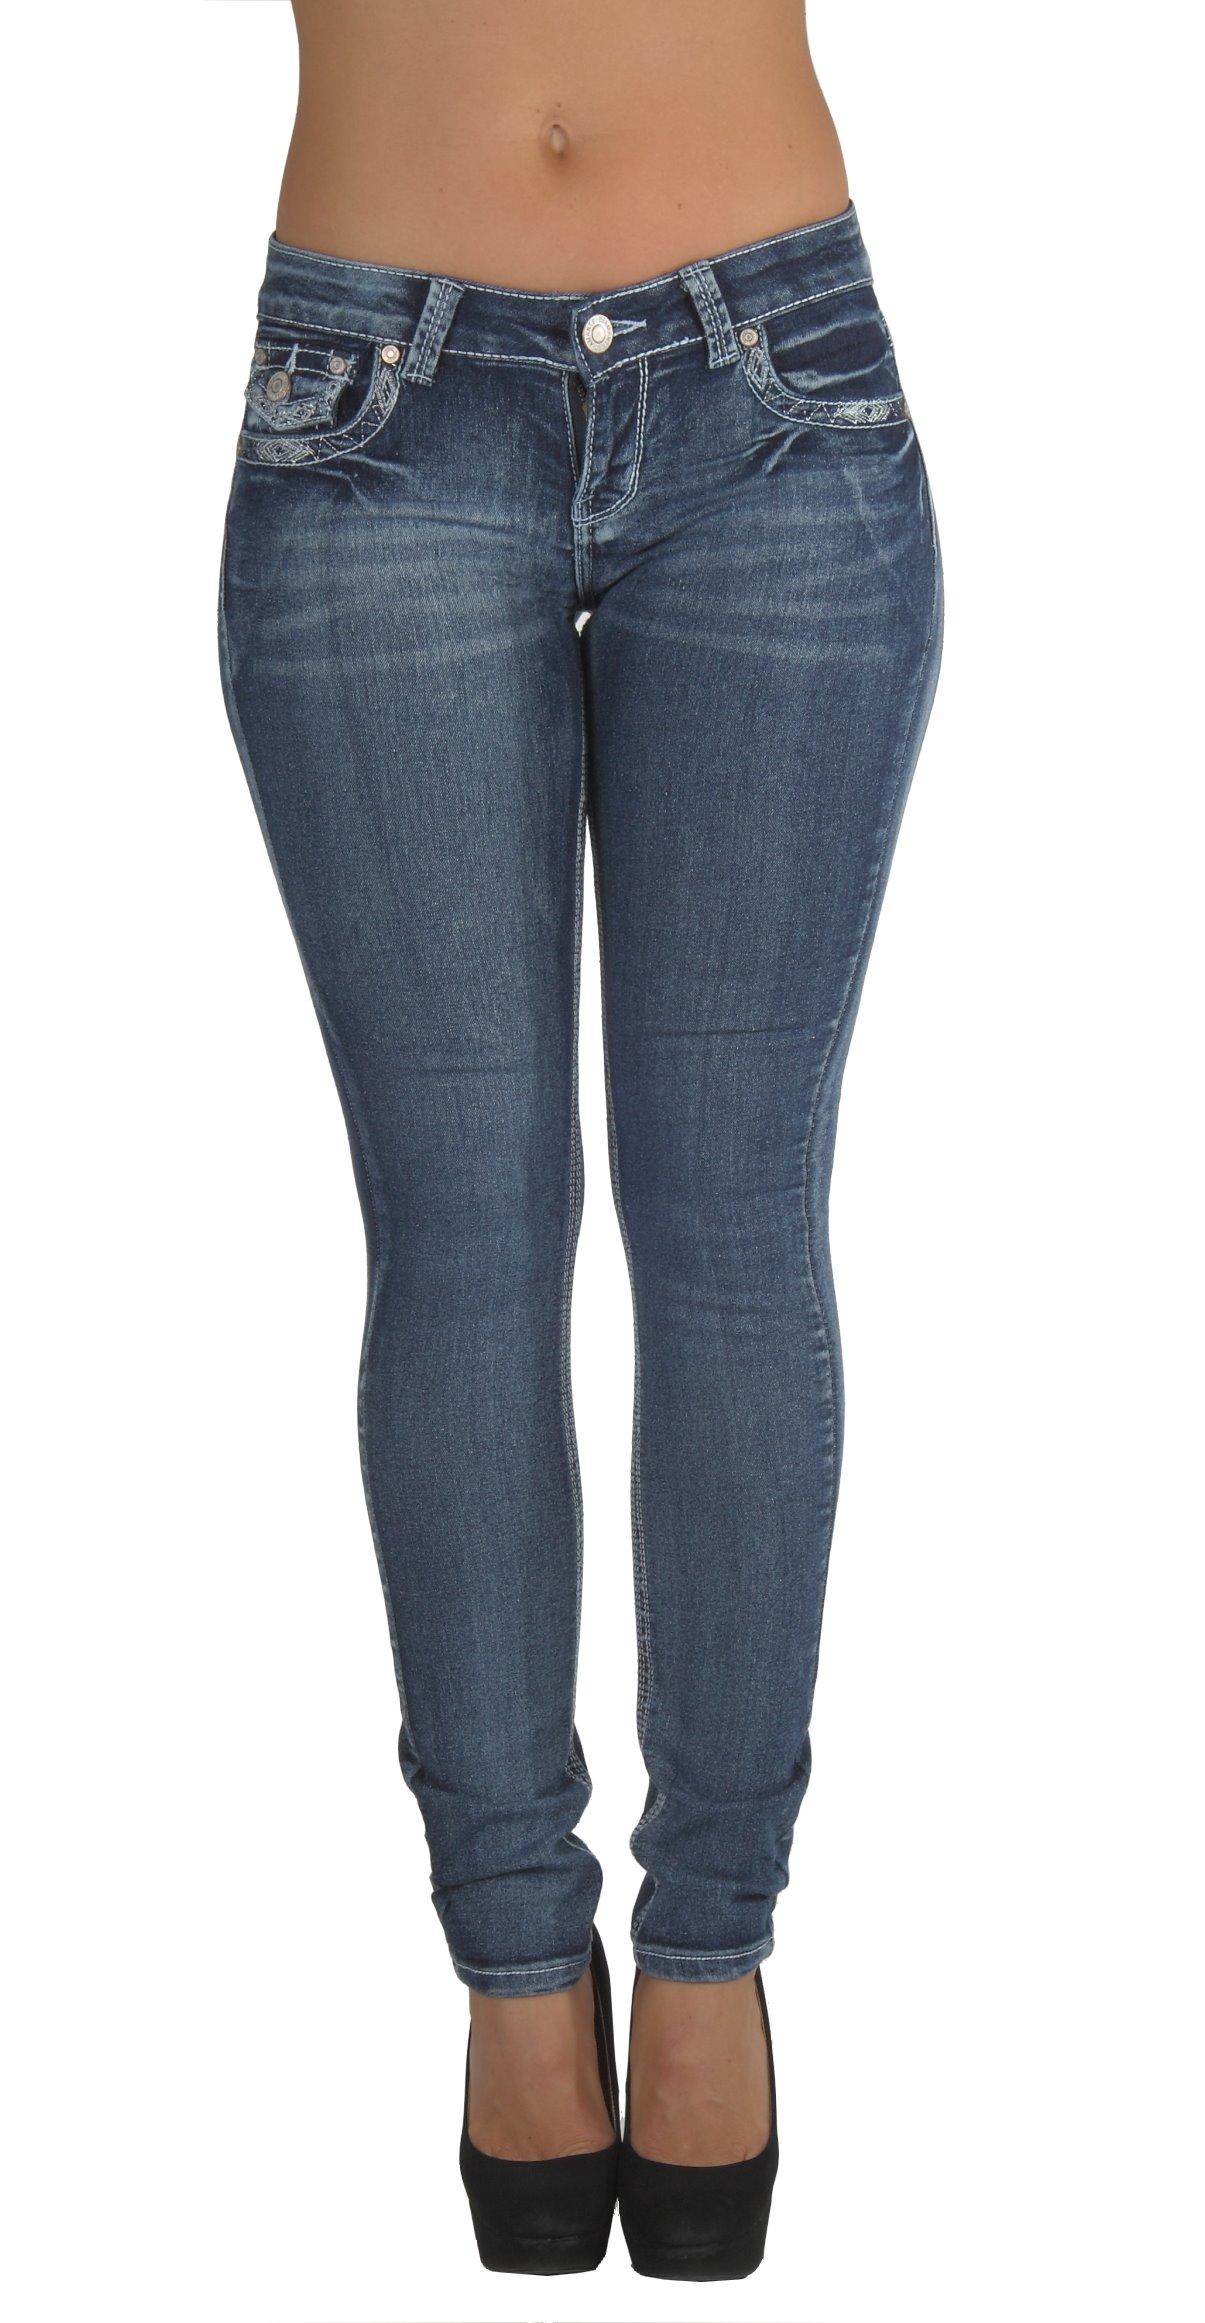 Womens Hydraulic Jeans